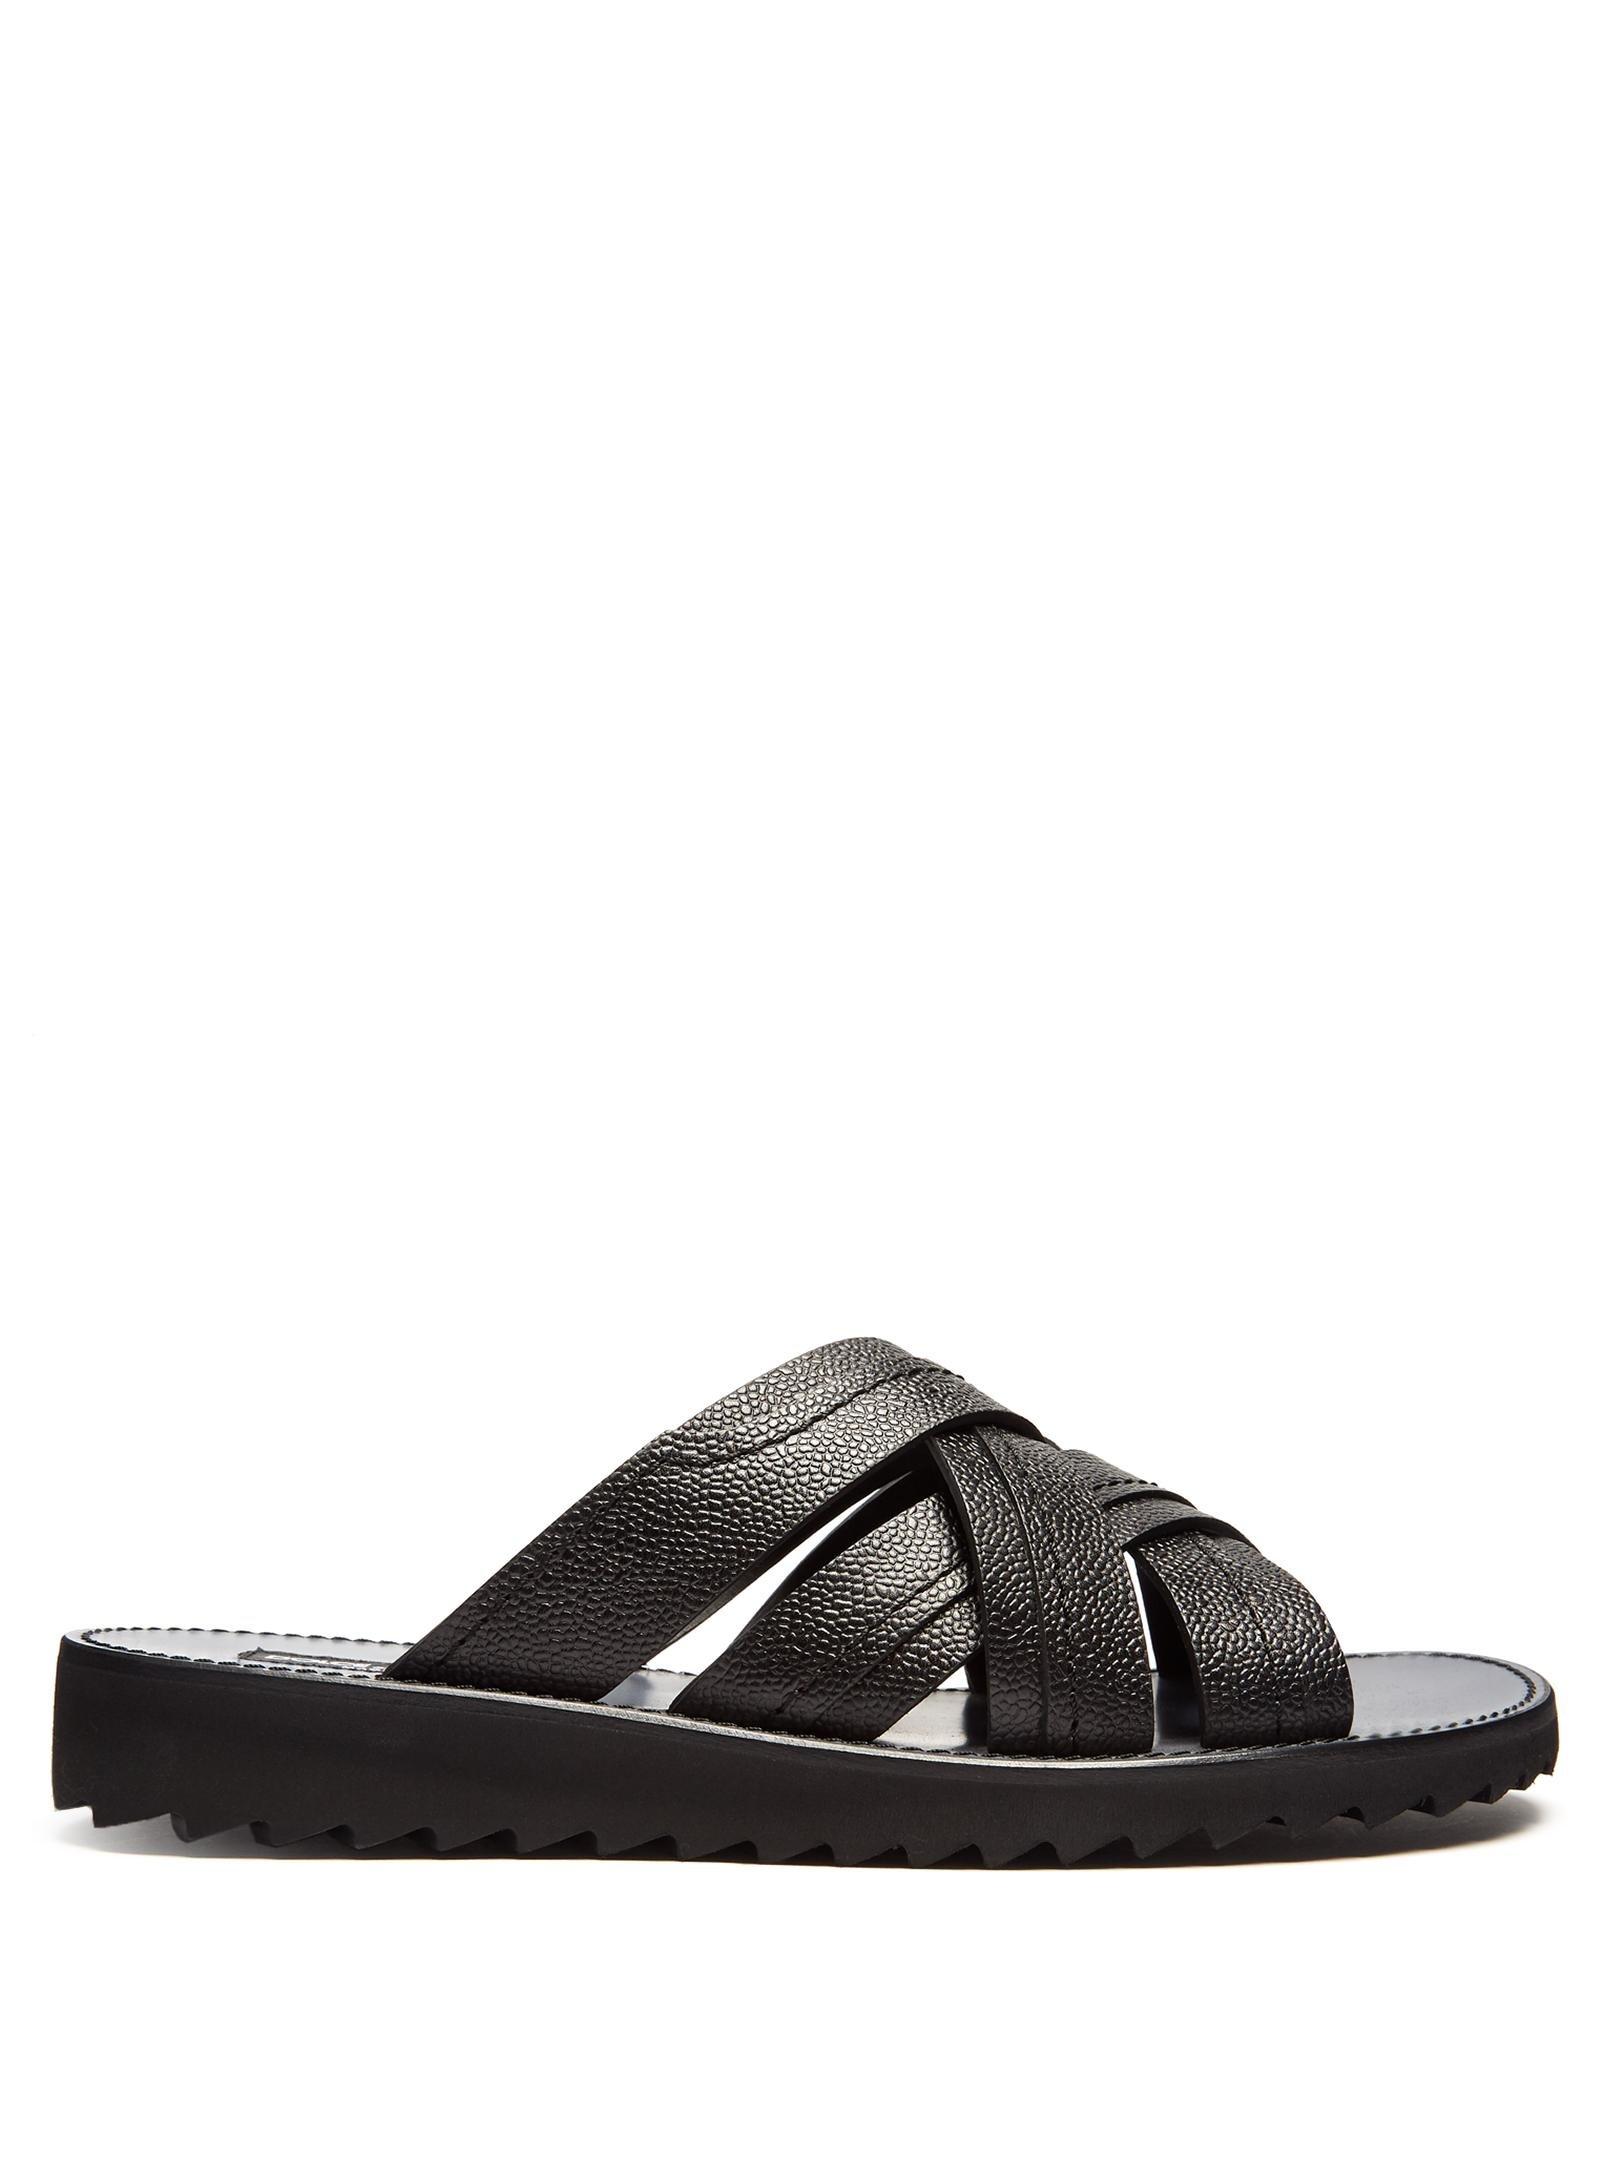 Dolce & gabbana Multi-strap Leather Sandals in Black for ...